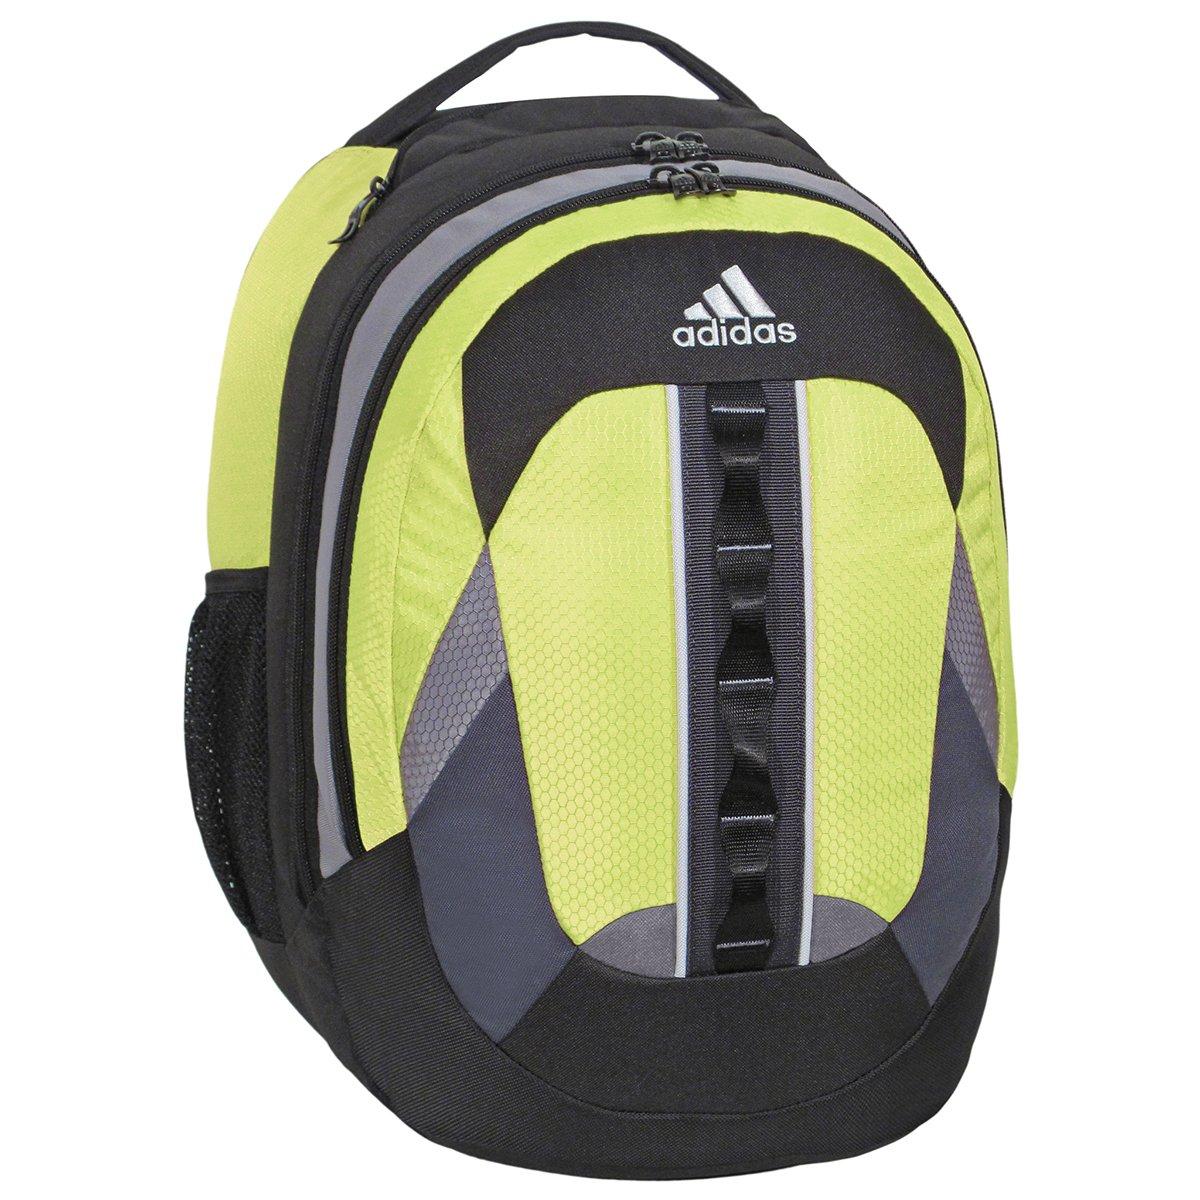 90c9c72761 Amazon.com  adidas Ridgemont Backpack